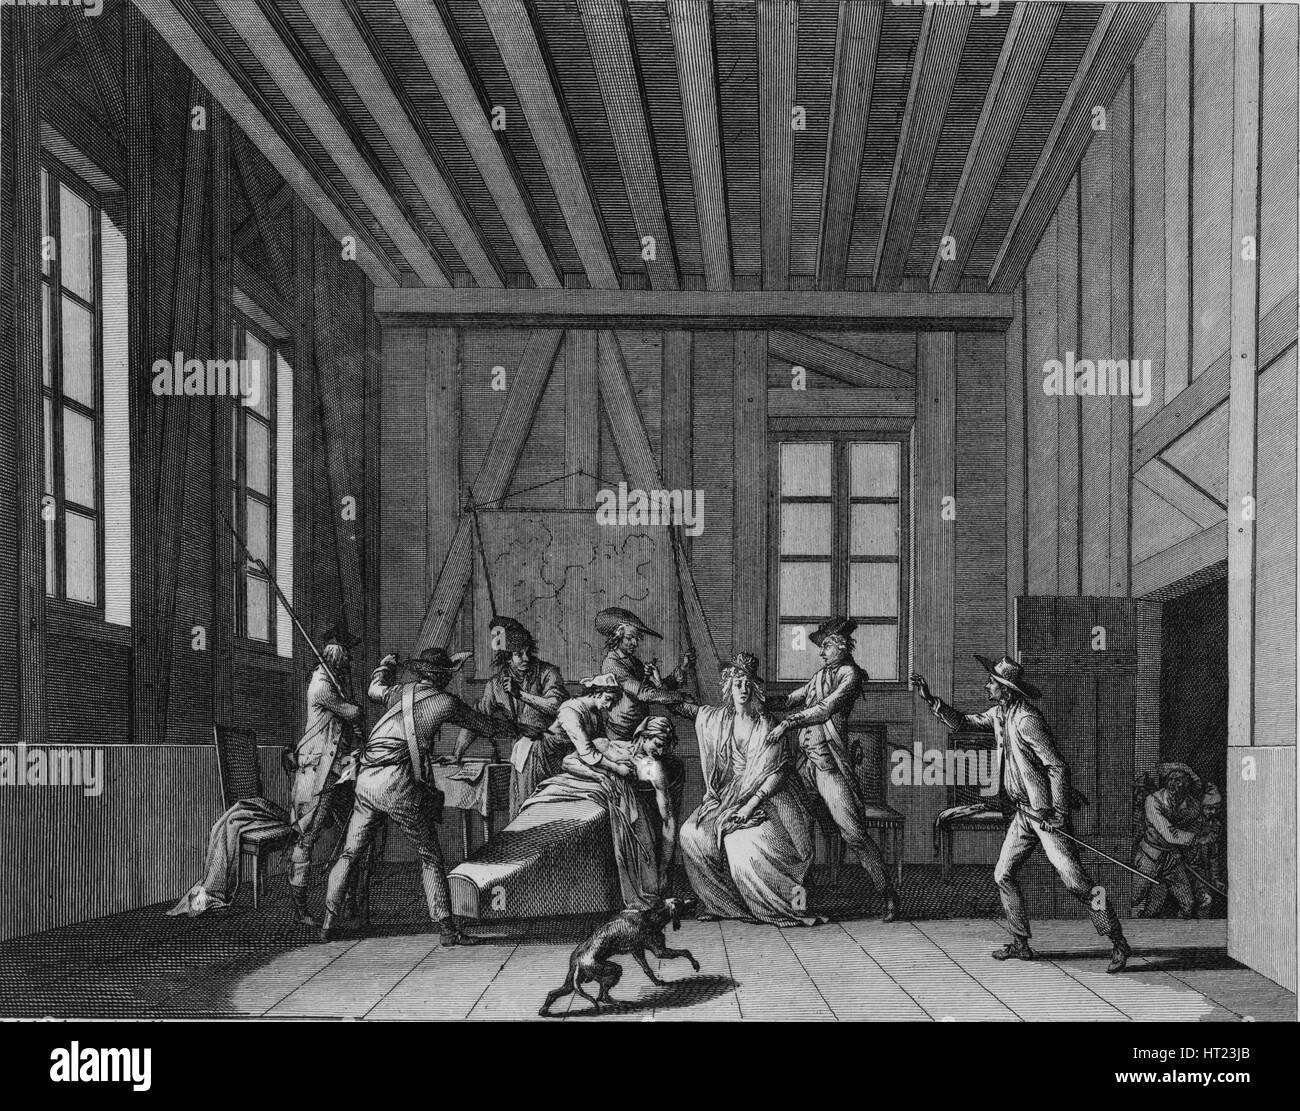 The Assassination of Jean-Paul Marat, c. 1795. Artist: Berthault, Pierre Gabriel (1748-1819) - Stock Image